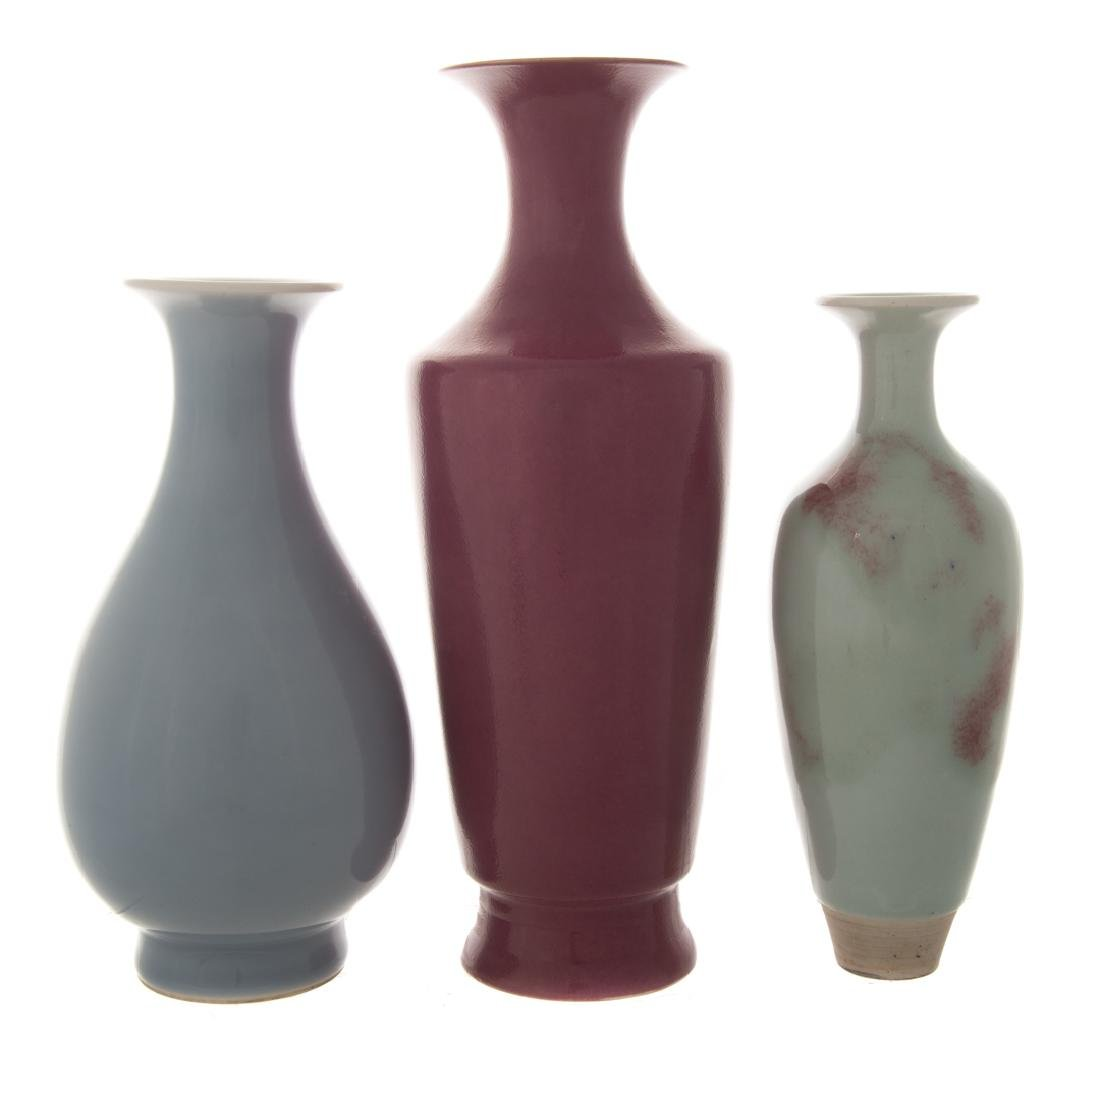 Three Chinese monochrome porcelain vases